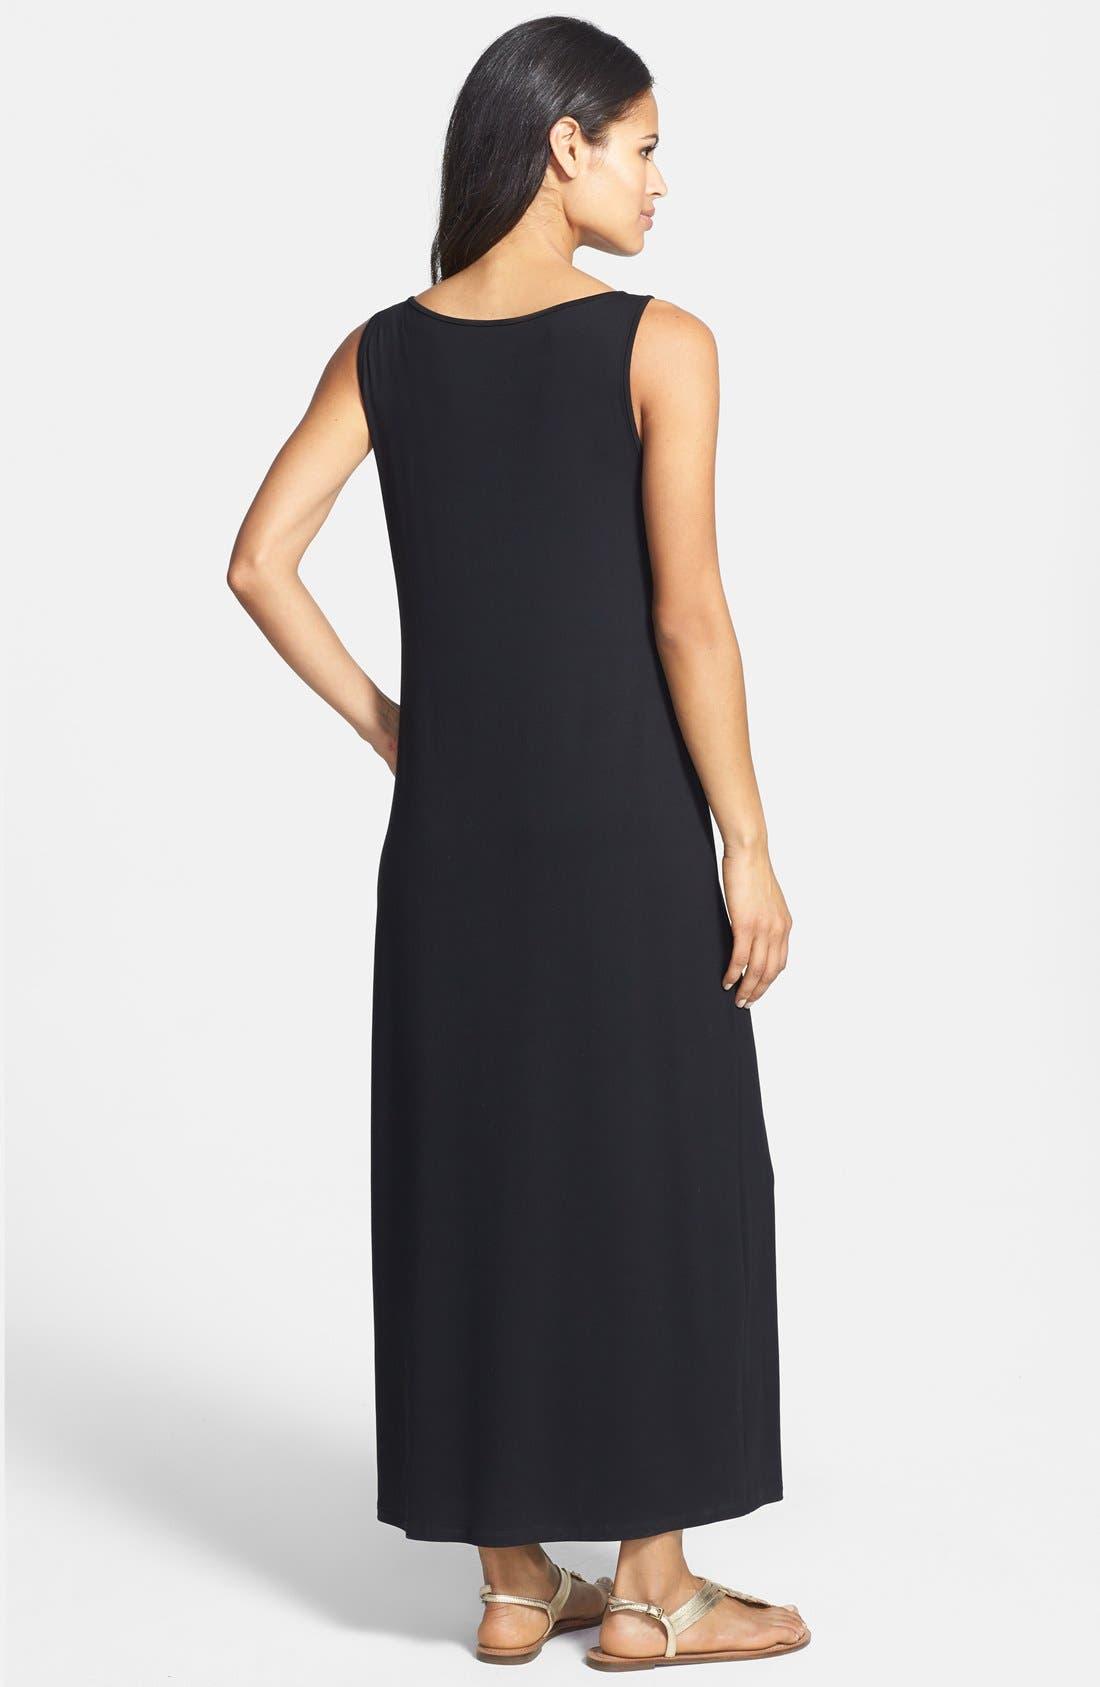 Alternate Image 2  - Eileen Fisher Scoop Neck Jersey Dress (Petite)